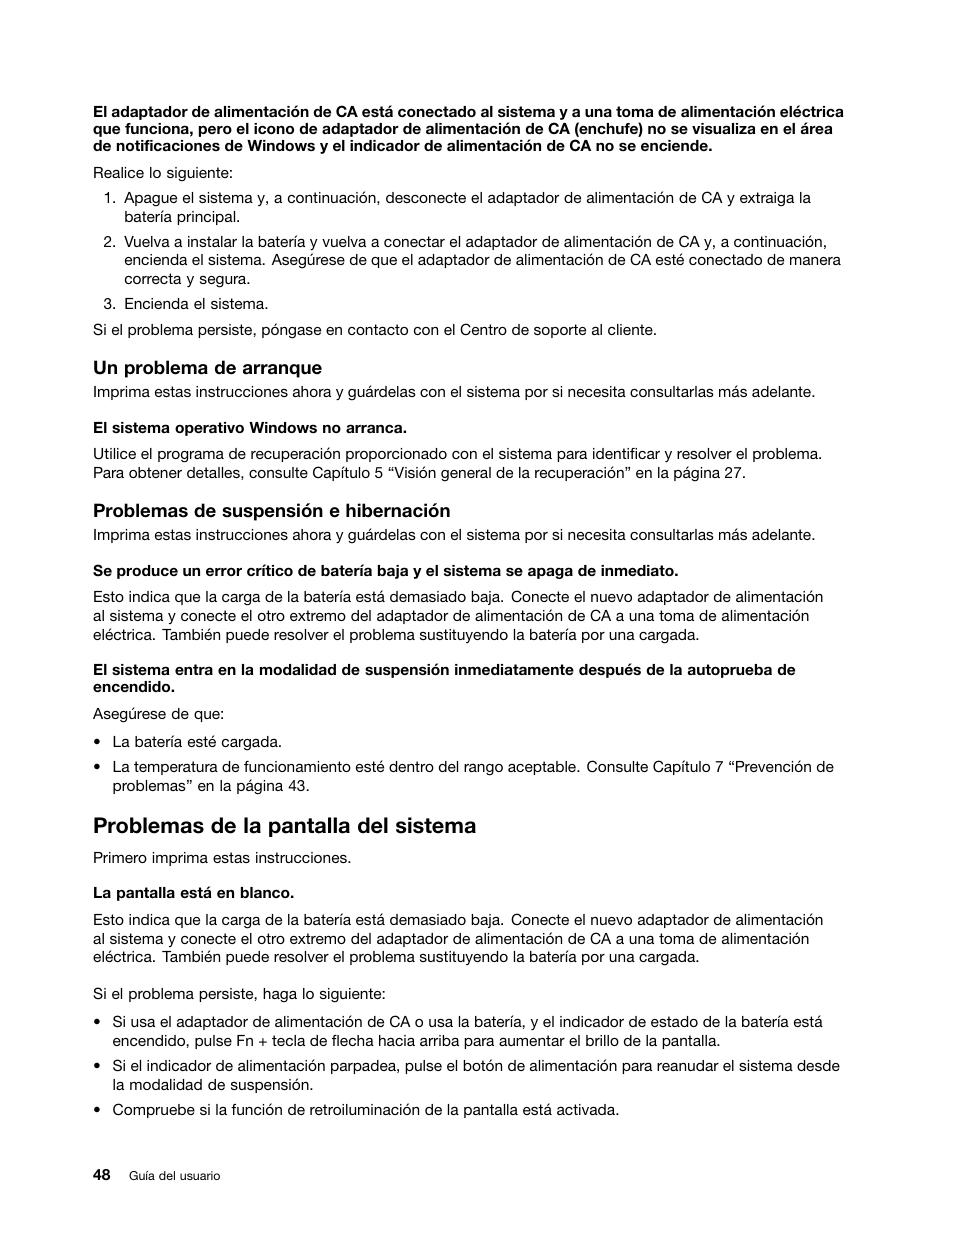 Problemas de la pantalla del sistema | Lenovo M490s notebook Manual ...